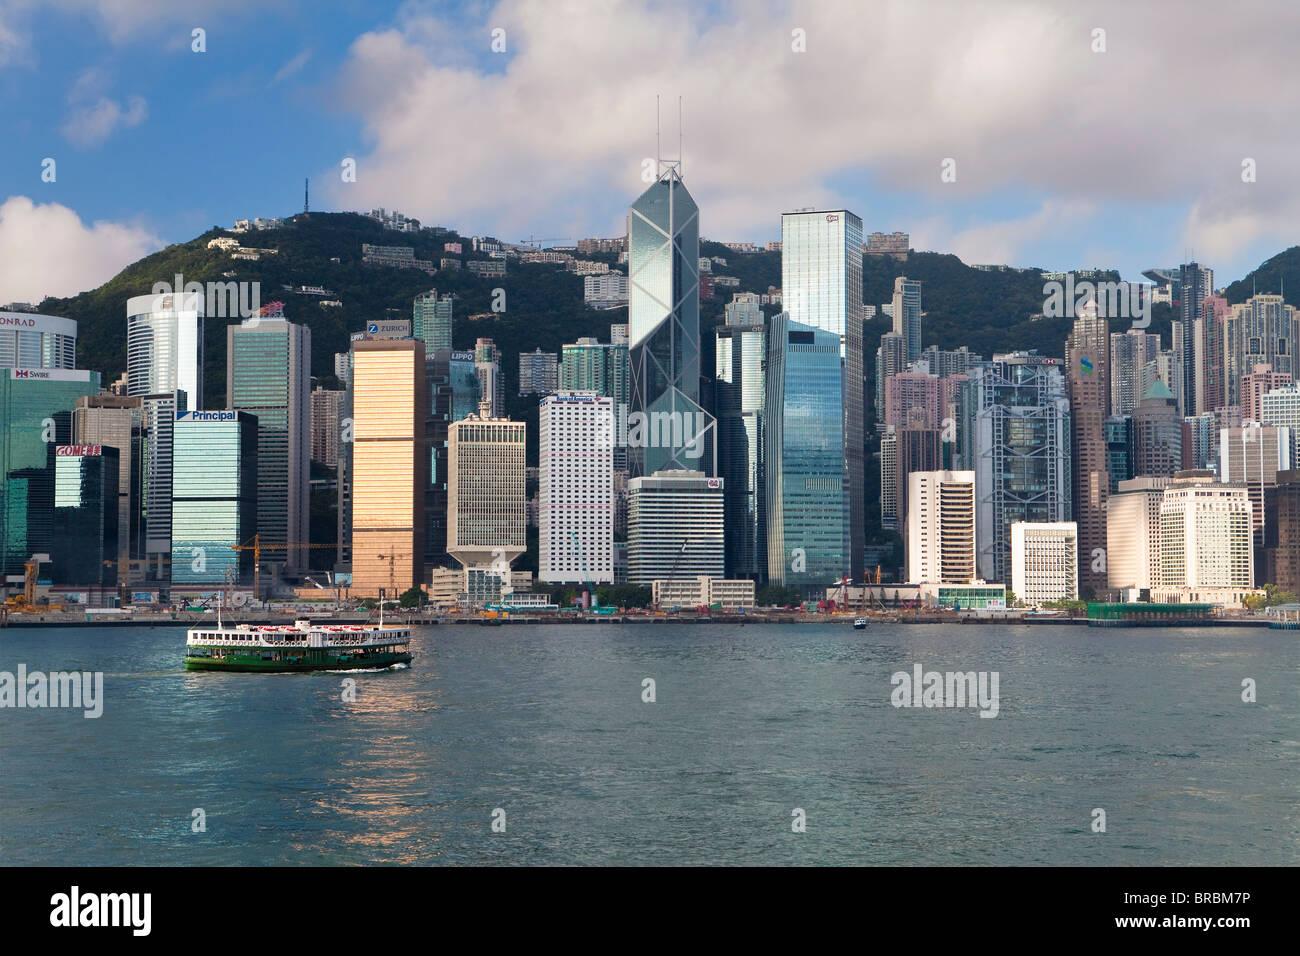 Skyline di Central, Isola di Hong Kong, dal Victoria Harbour, Hong Kong, Cina Immagini Stock